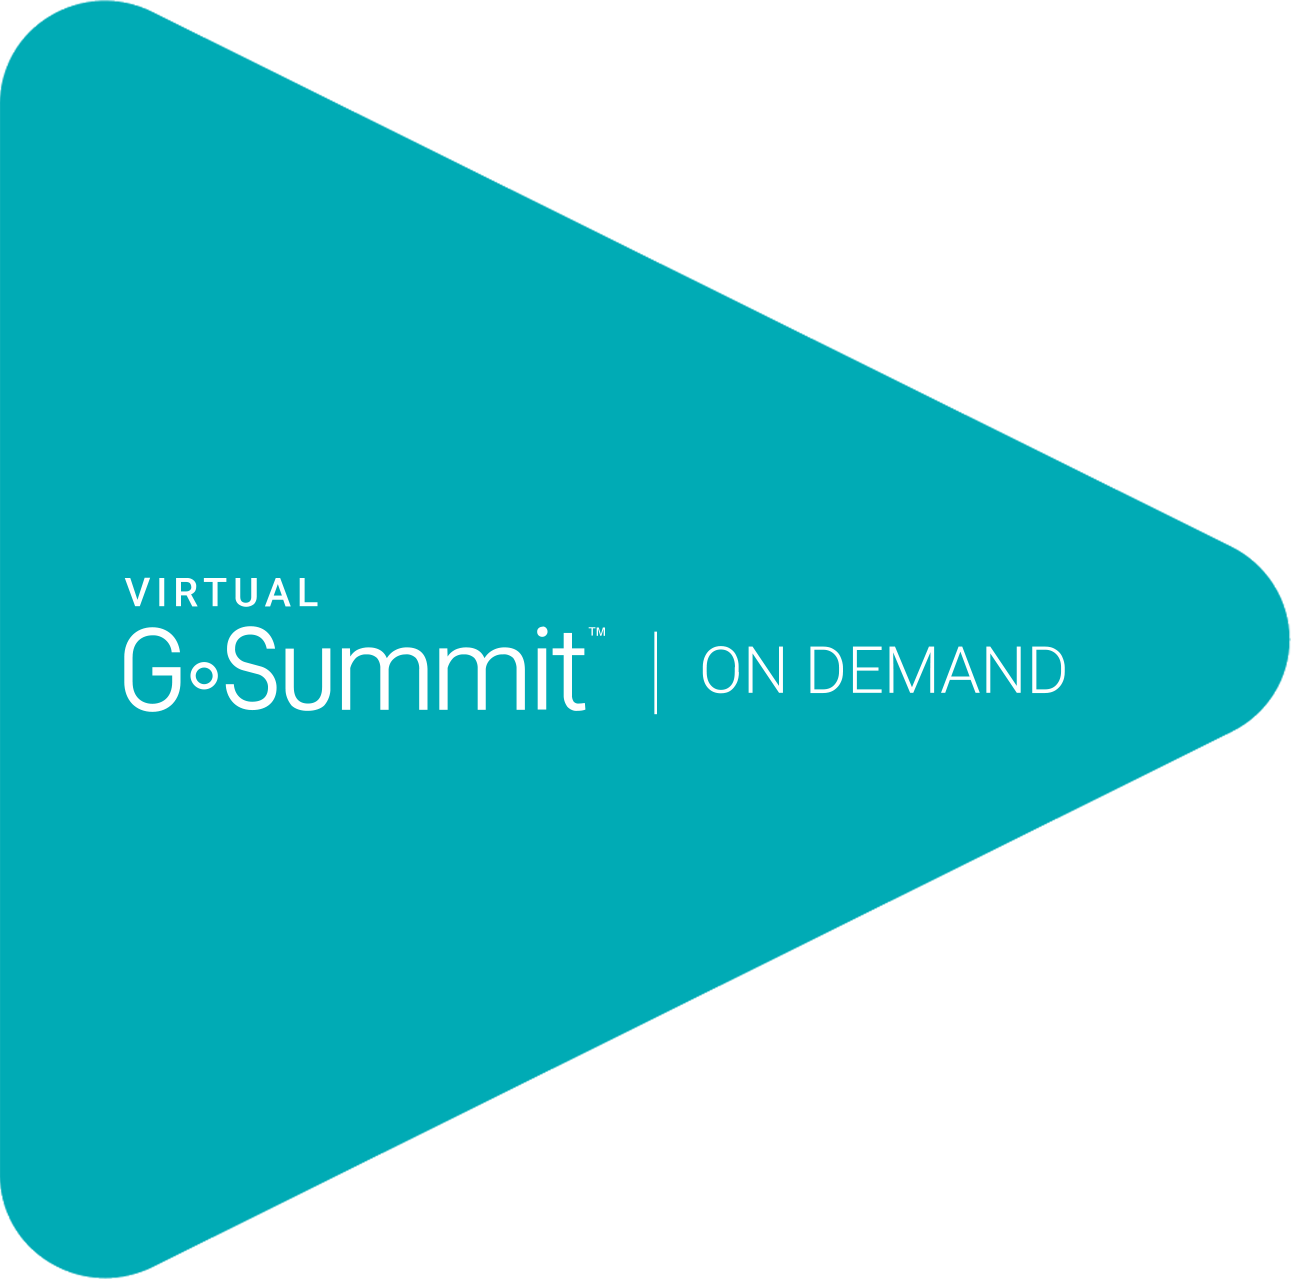 G summit on demand play button